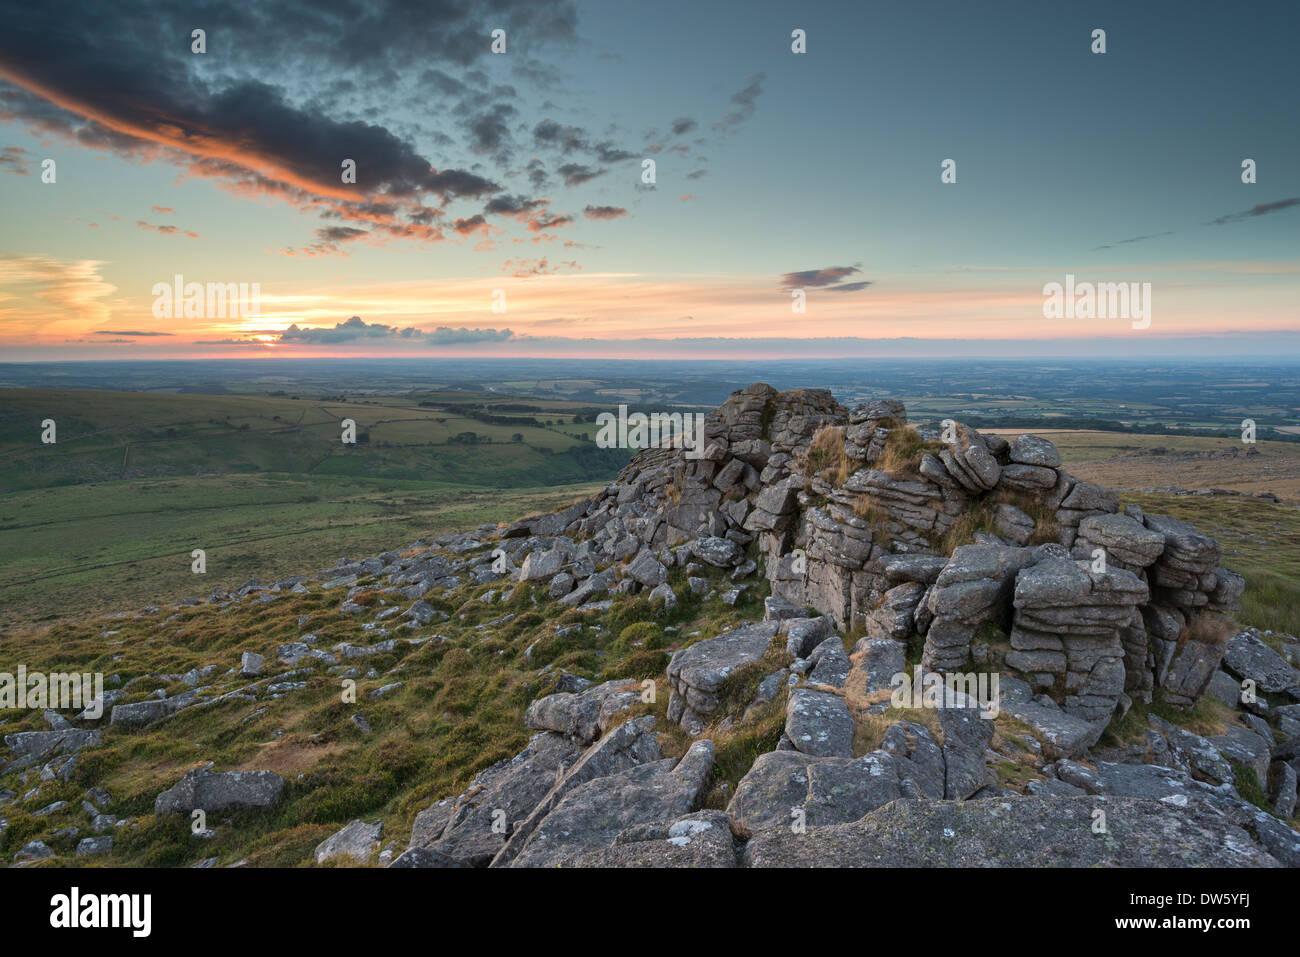 Summer sunset over Dartmoor National Park, Devon, England. Summer (July) 2013. - Stock Image